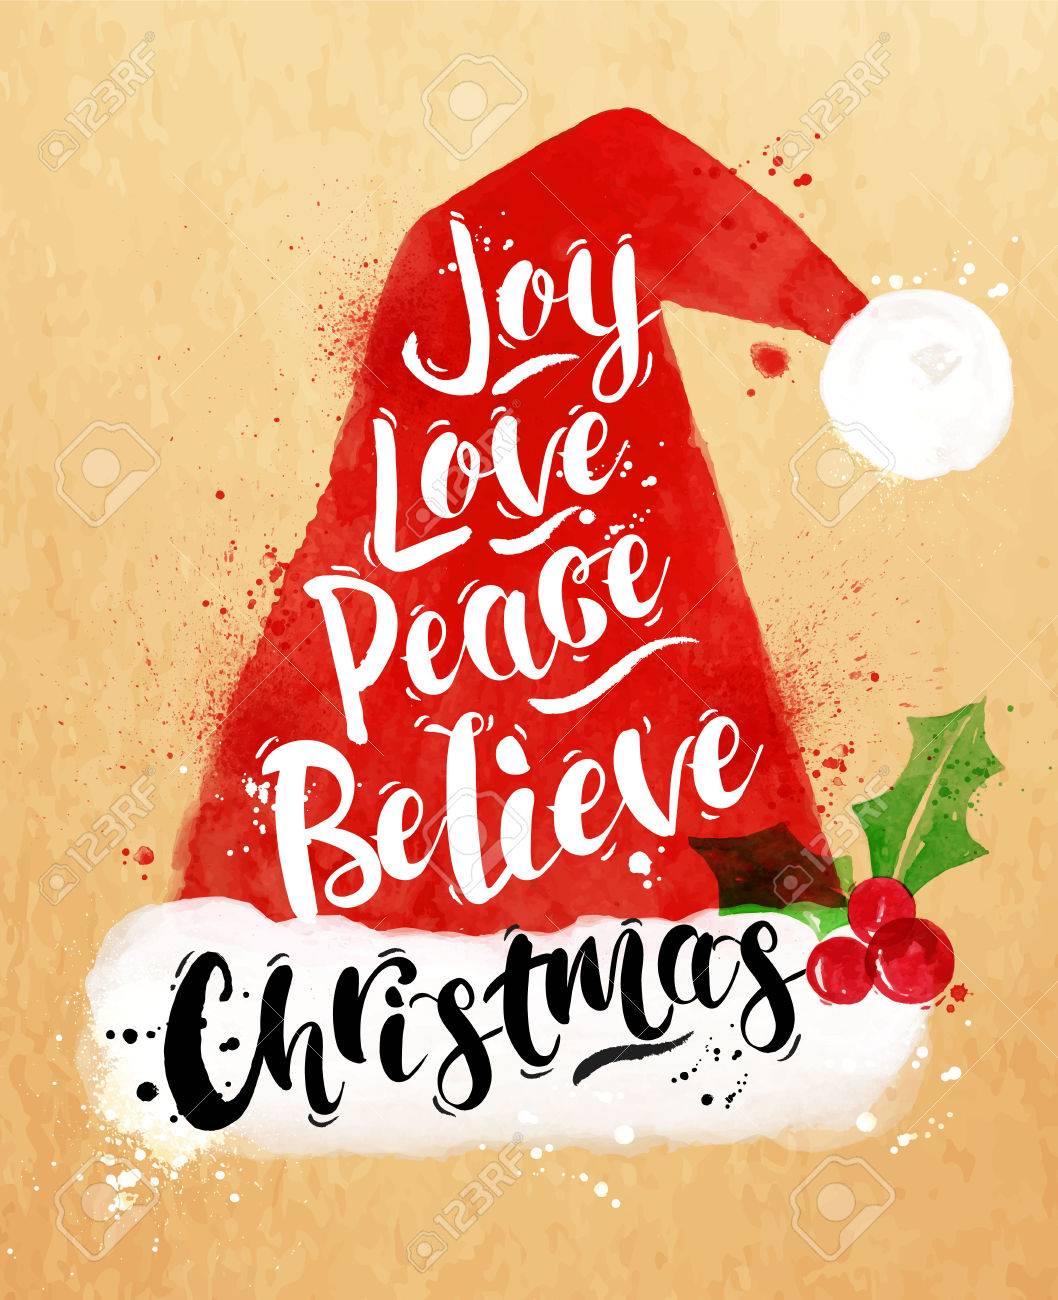 Watercolor poster Christmas Santa hat lettering joy, love, peace, believe, Christmas drawing in vintage style on kraft paper - 44161273